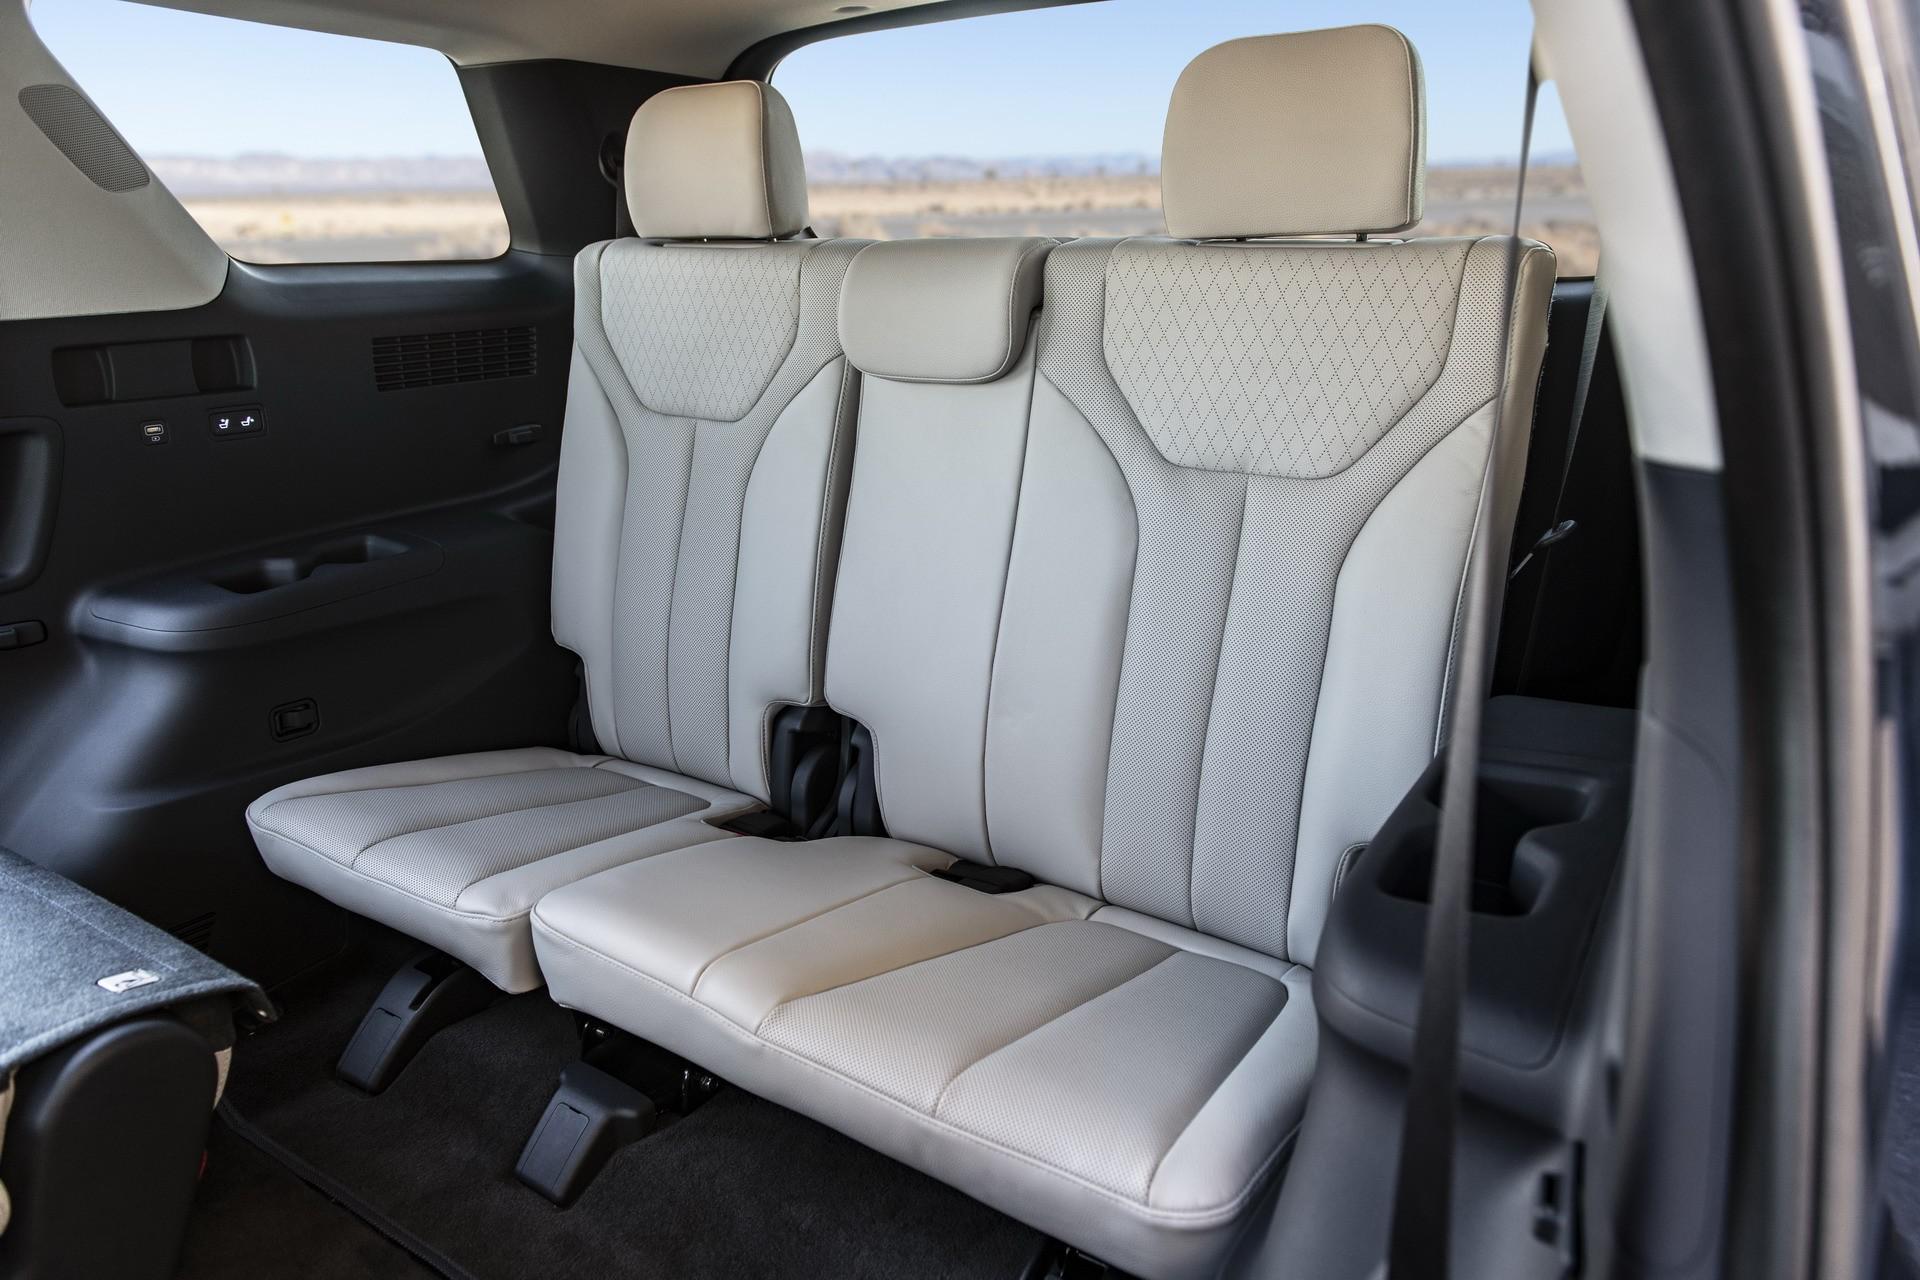 2020 Hyundai Palisade Oozes 8-Seat Crossover Luxury